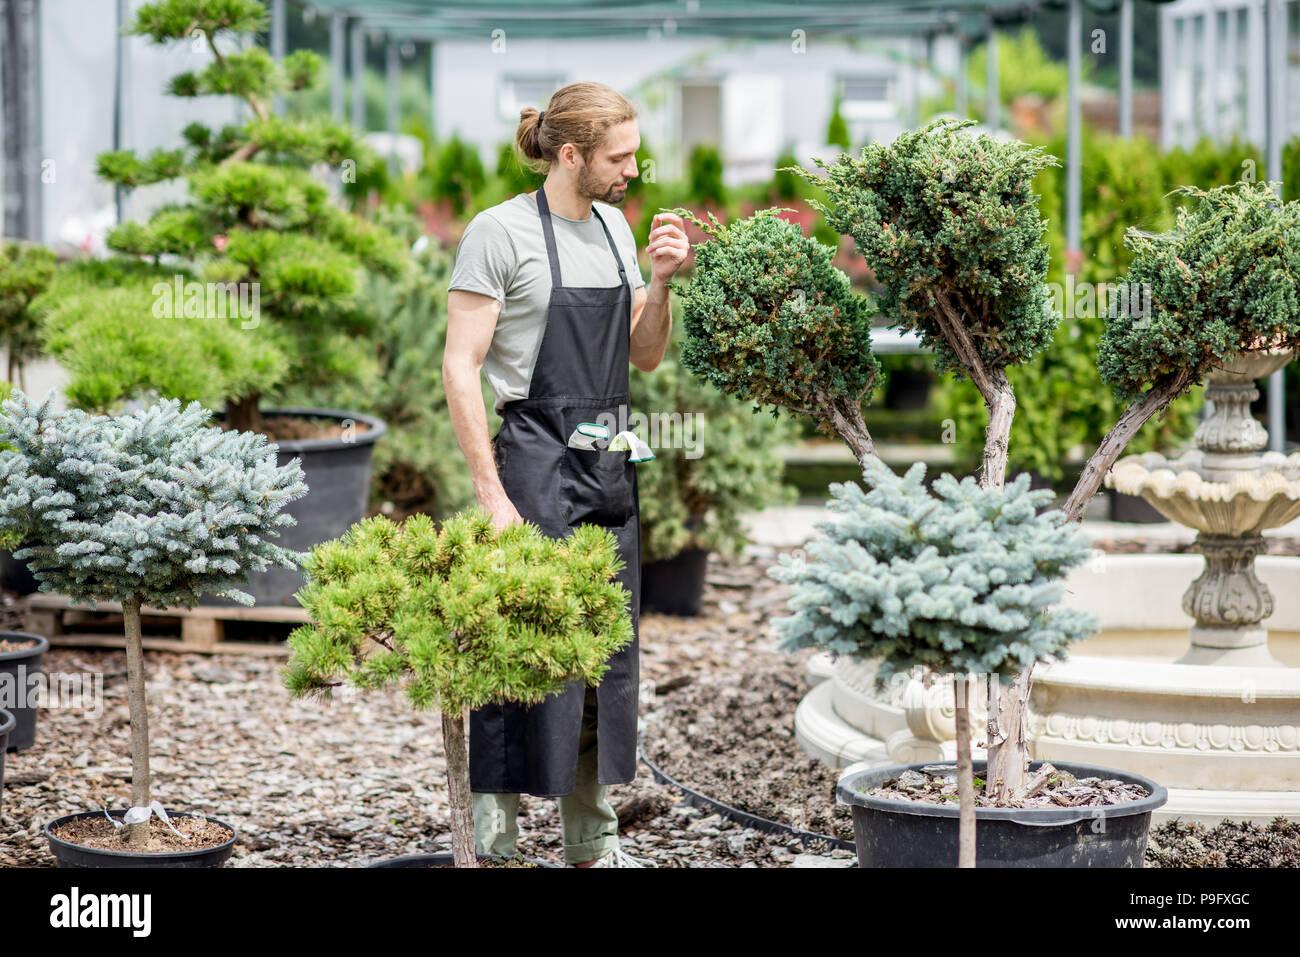 Landscaping stockfotos landscaping bilder alamy for Garten arbeiten